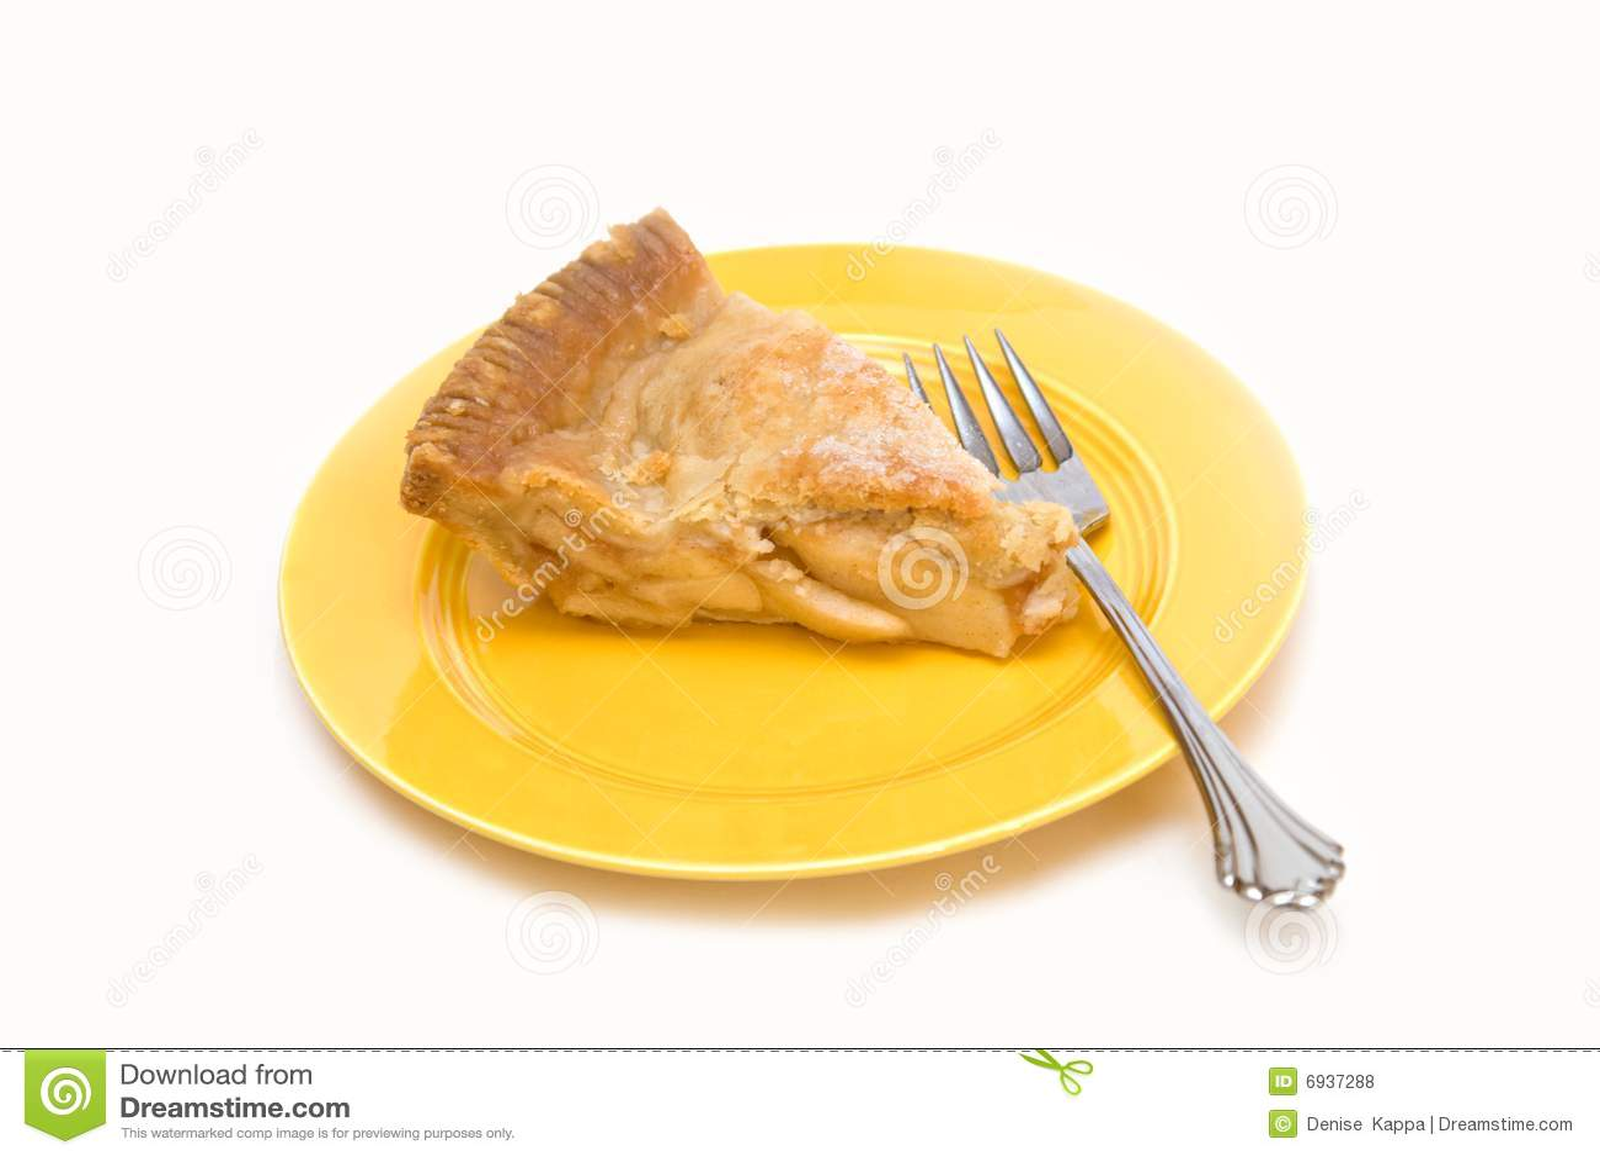 Slice American Apple Pie Royalty Free Stock Photos - Image ...